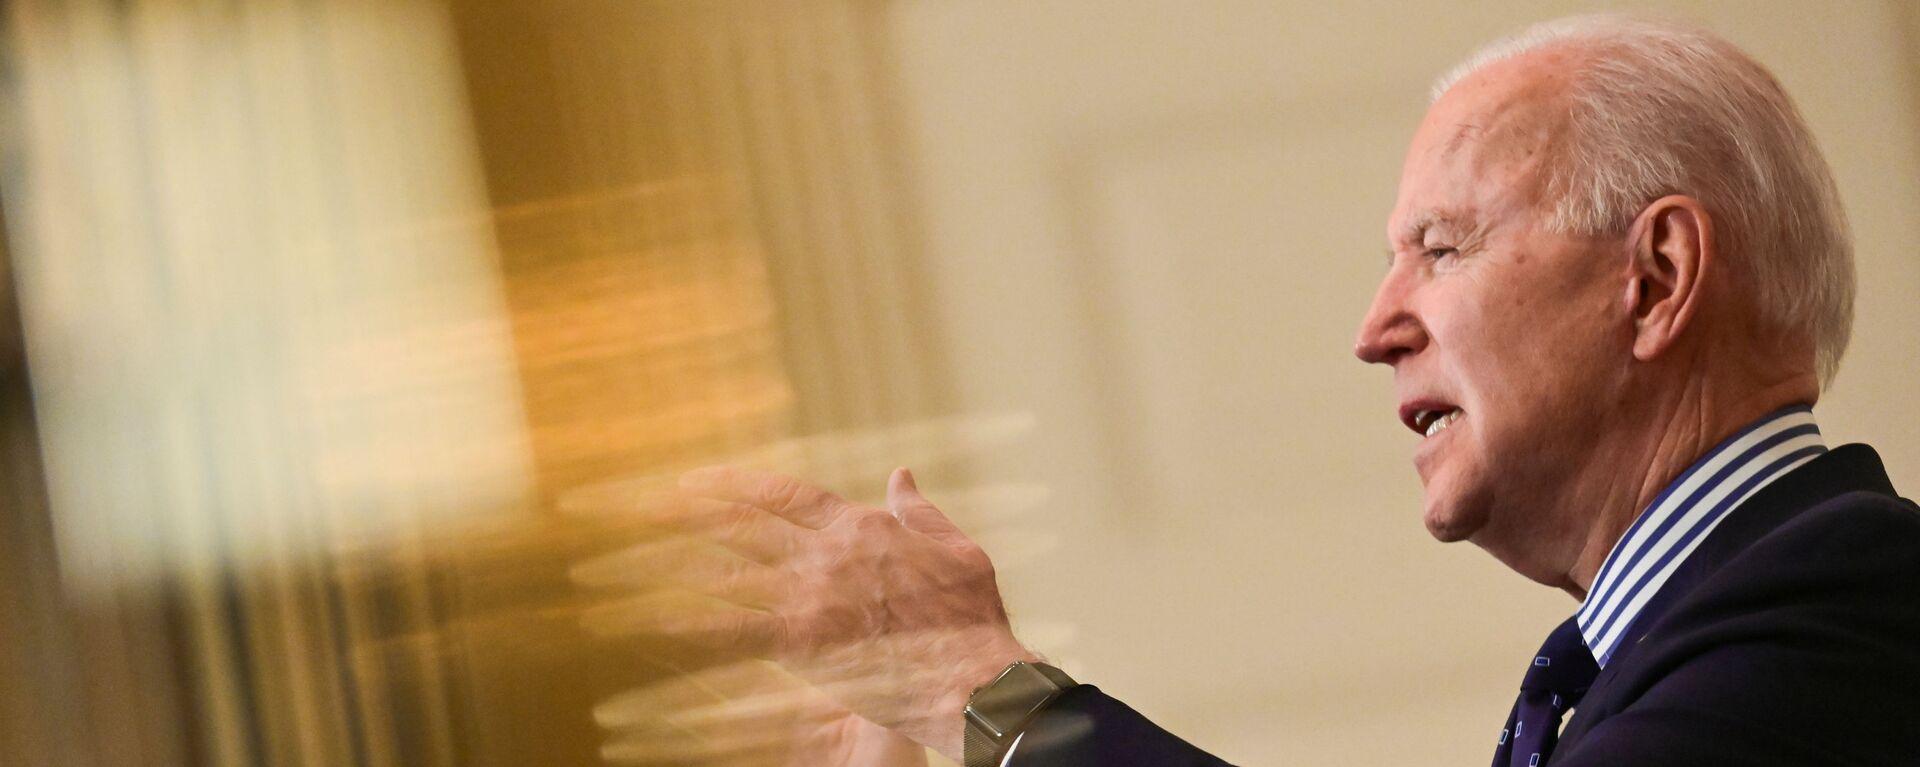 Prezidnet USA Joe Biden - Sputnik Česká republika, 1920, 20.04.2021